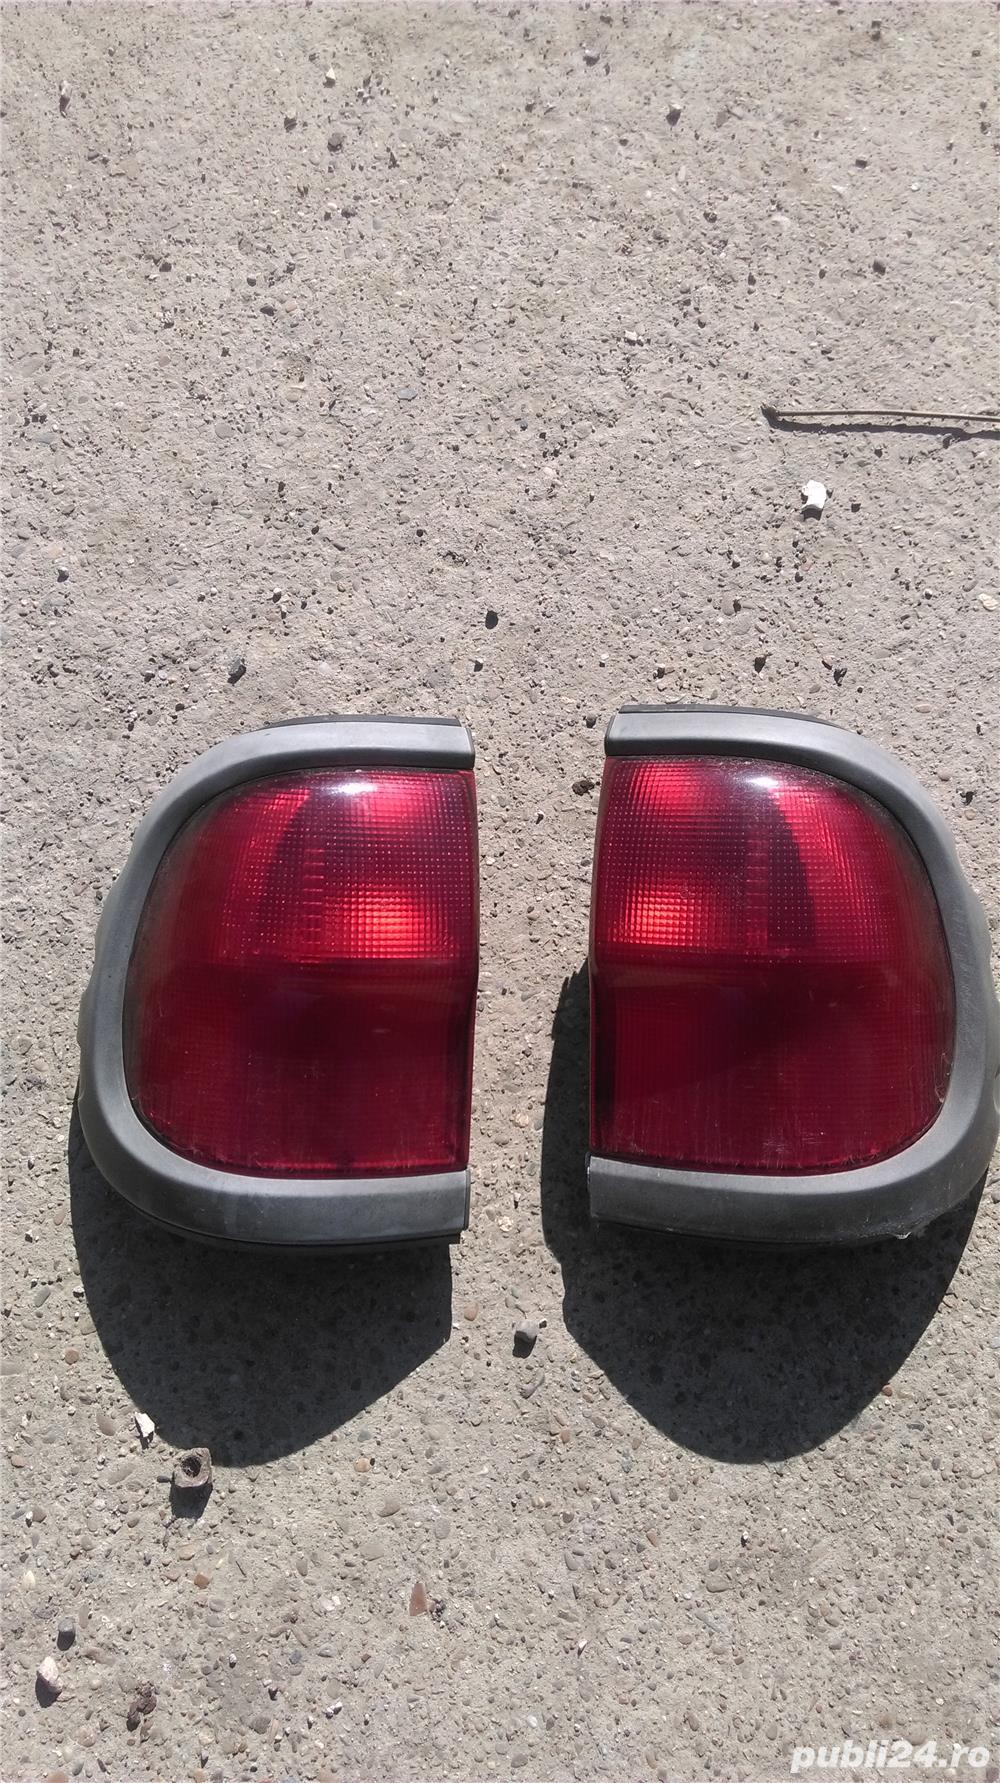 Stopuri lampa pozitie nissan terano 2 R20